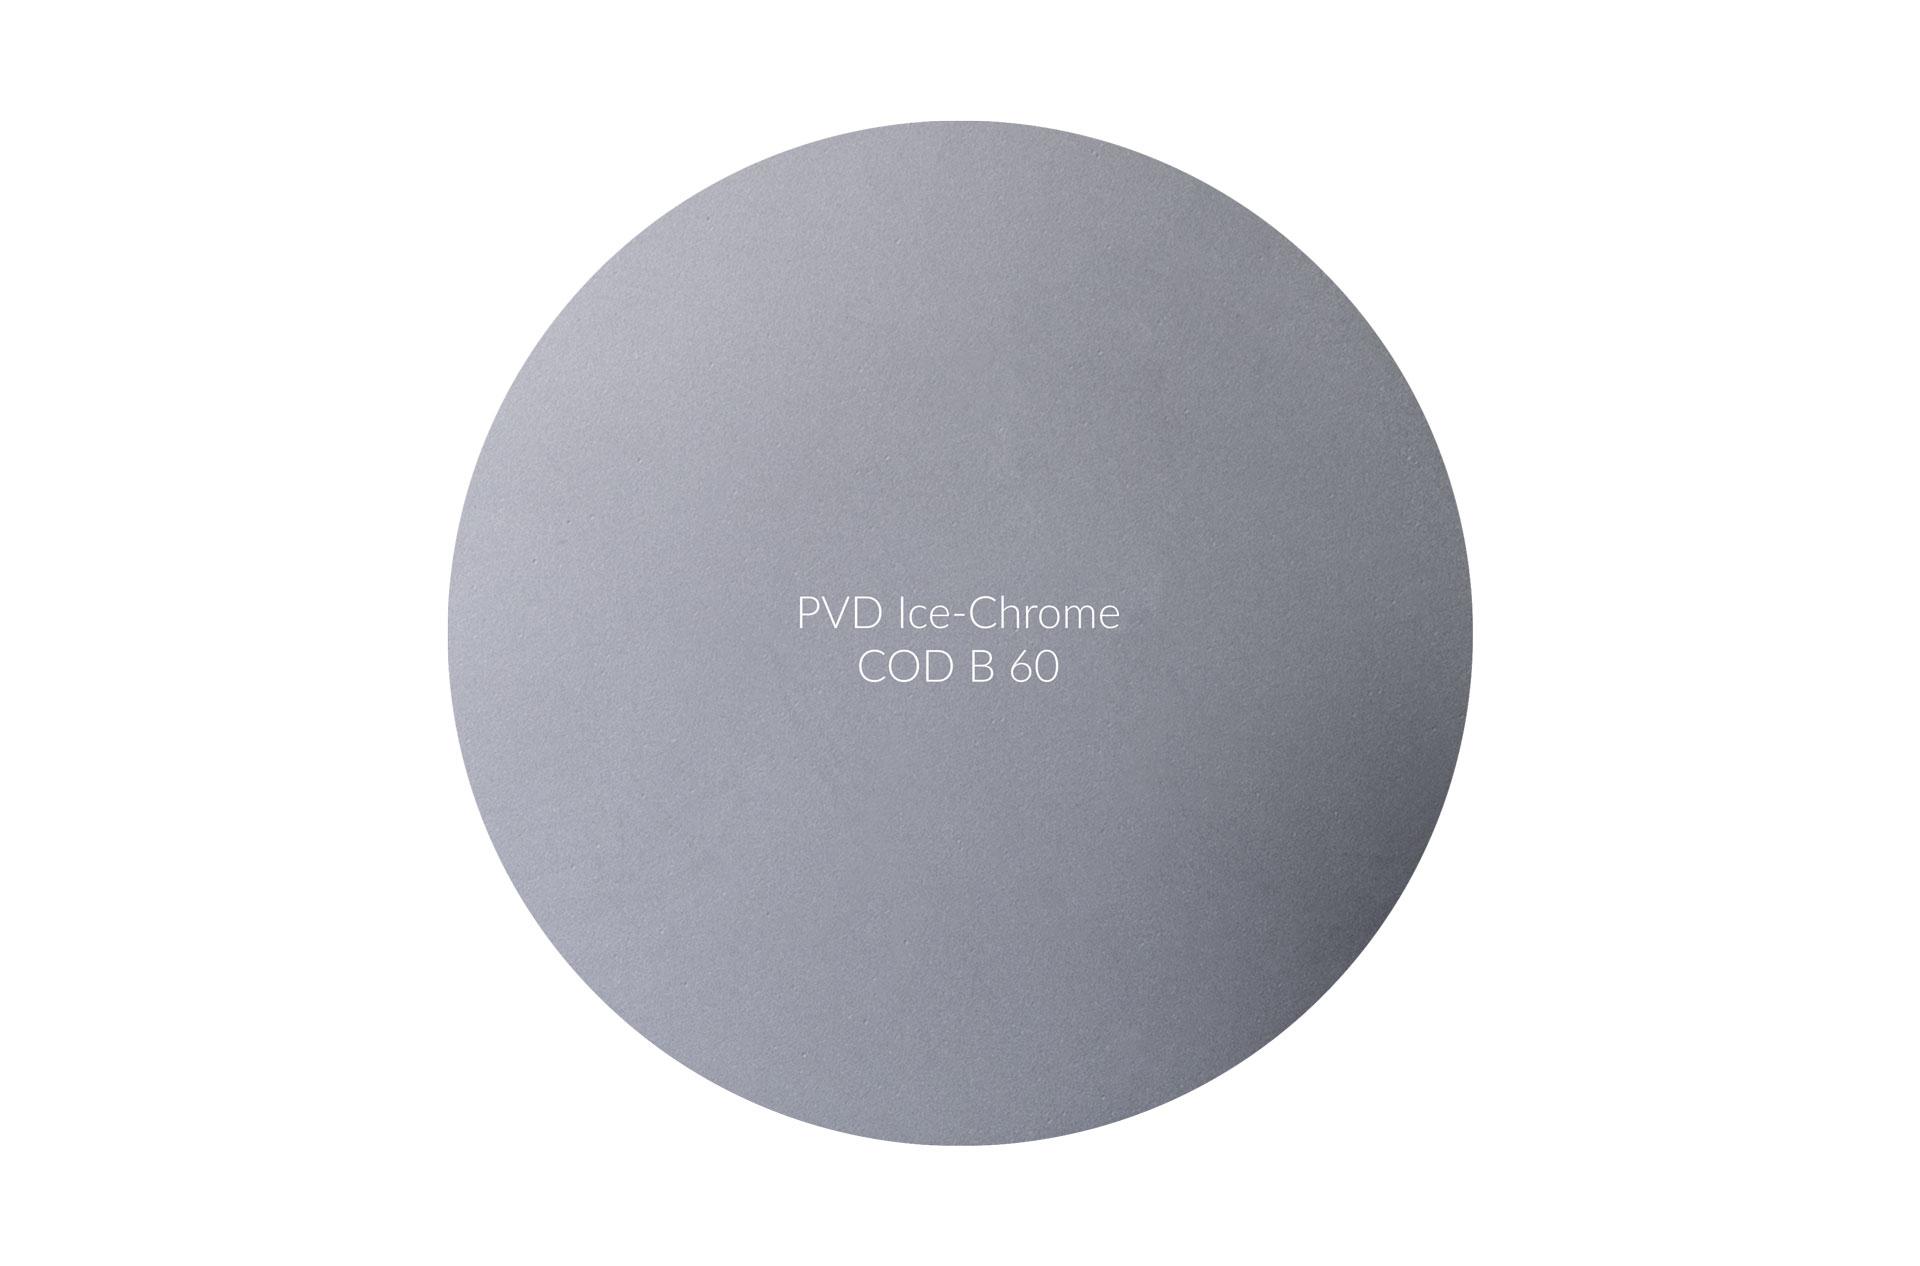 Dischetto PVD Ice-Chrome cod B 60 opaco